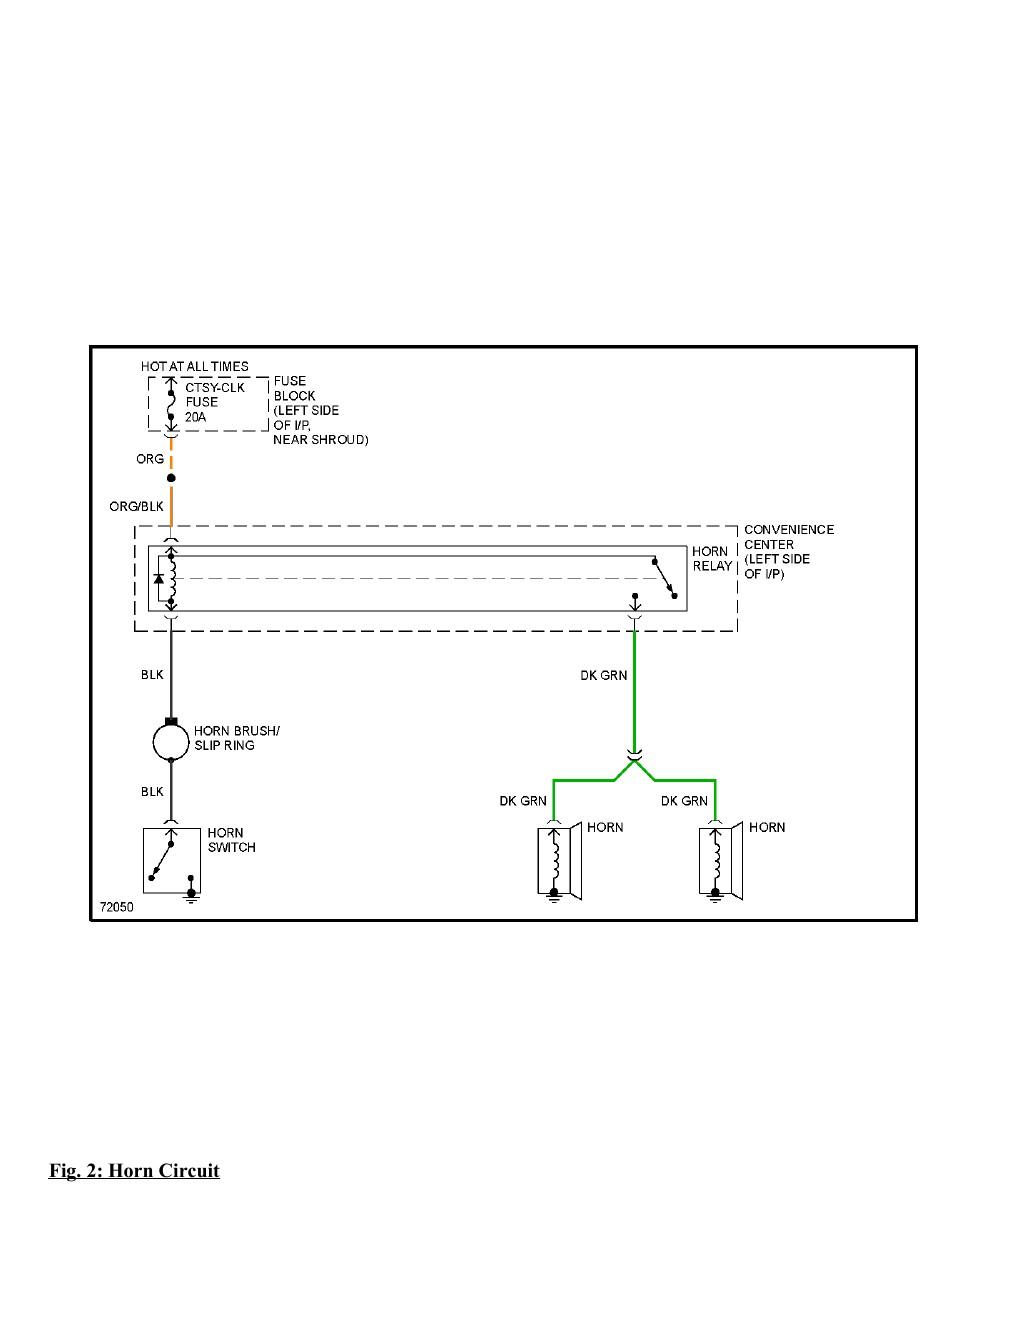 1995 chevy monte carlo wiring diagram 86 monte carlo fuse box diagram 2001 monte carlo fuse [ 1020 x 1320 Pixel ]